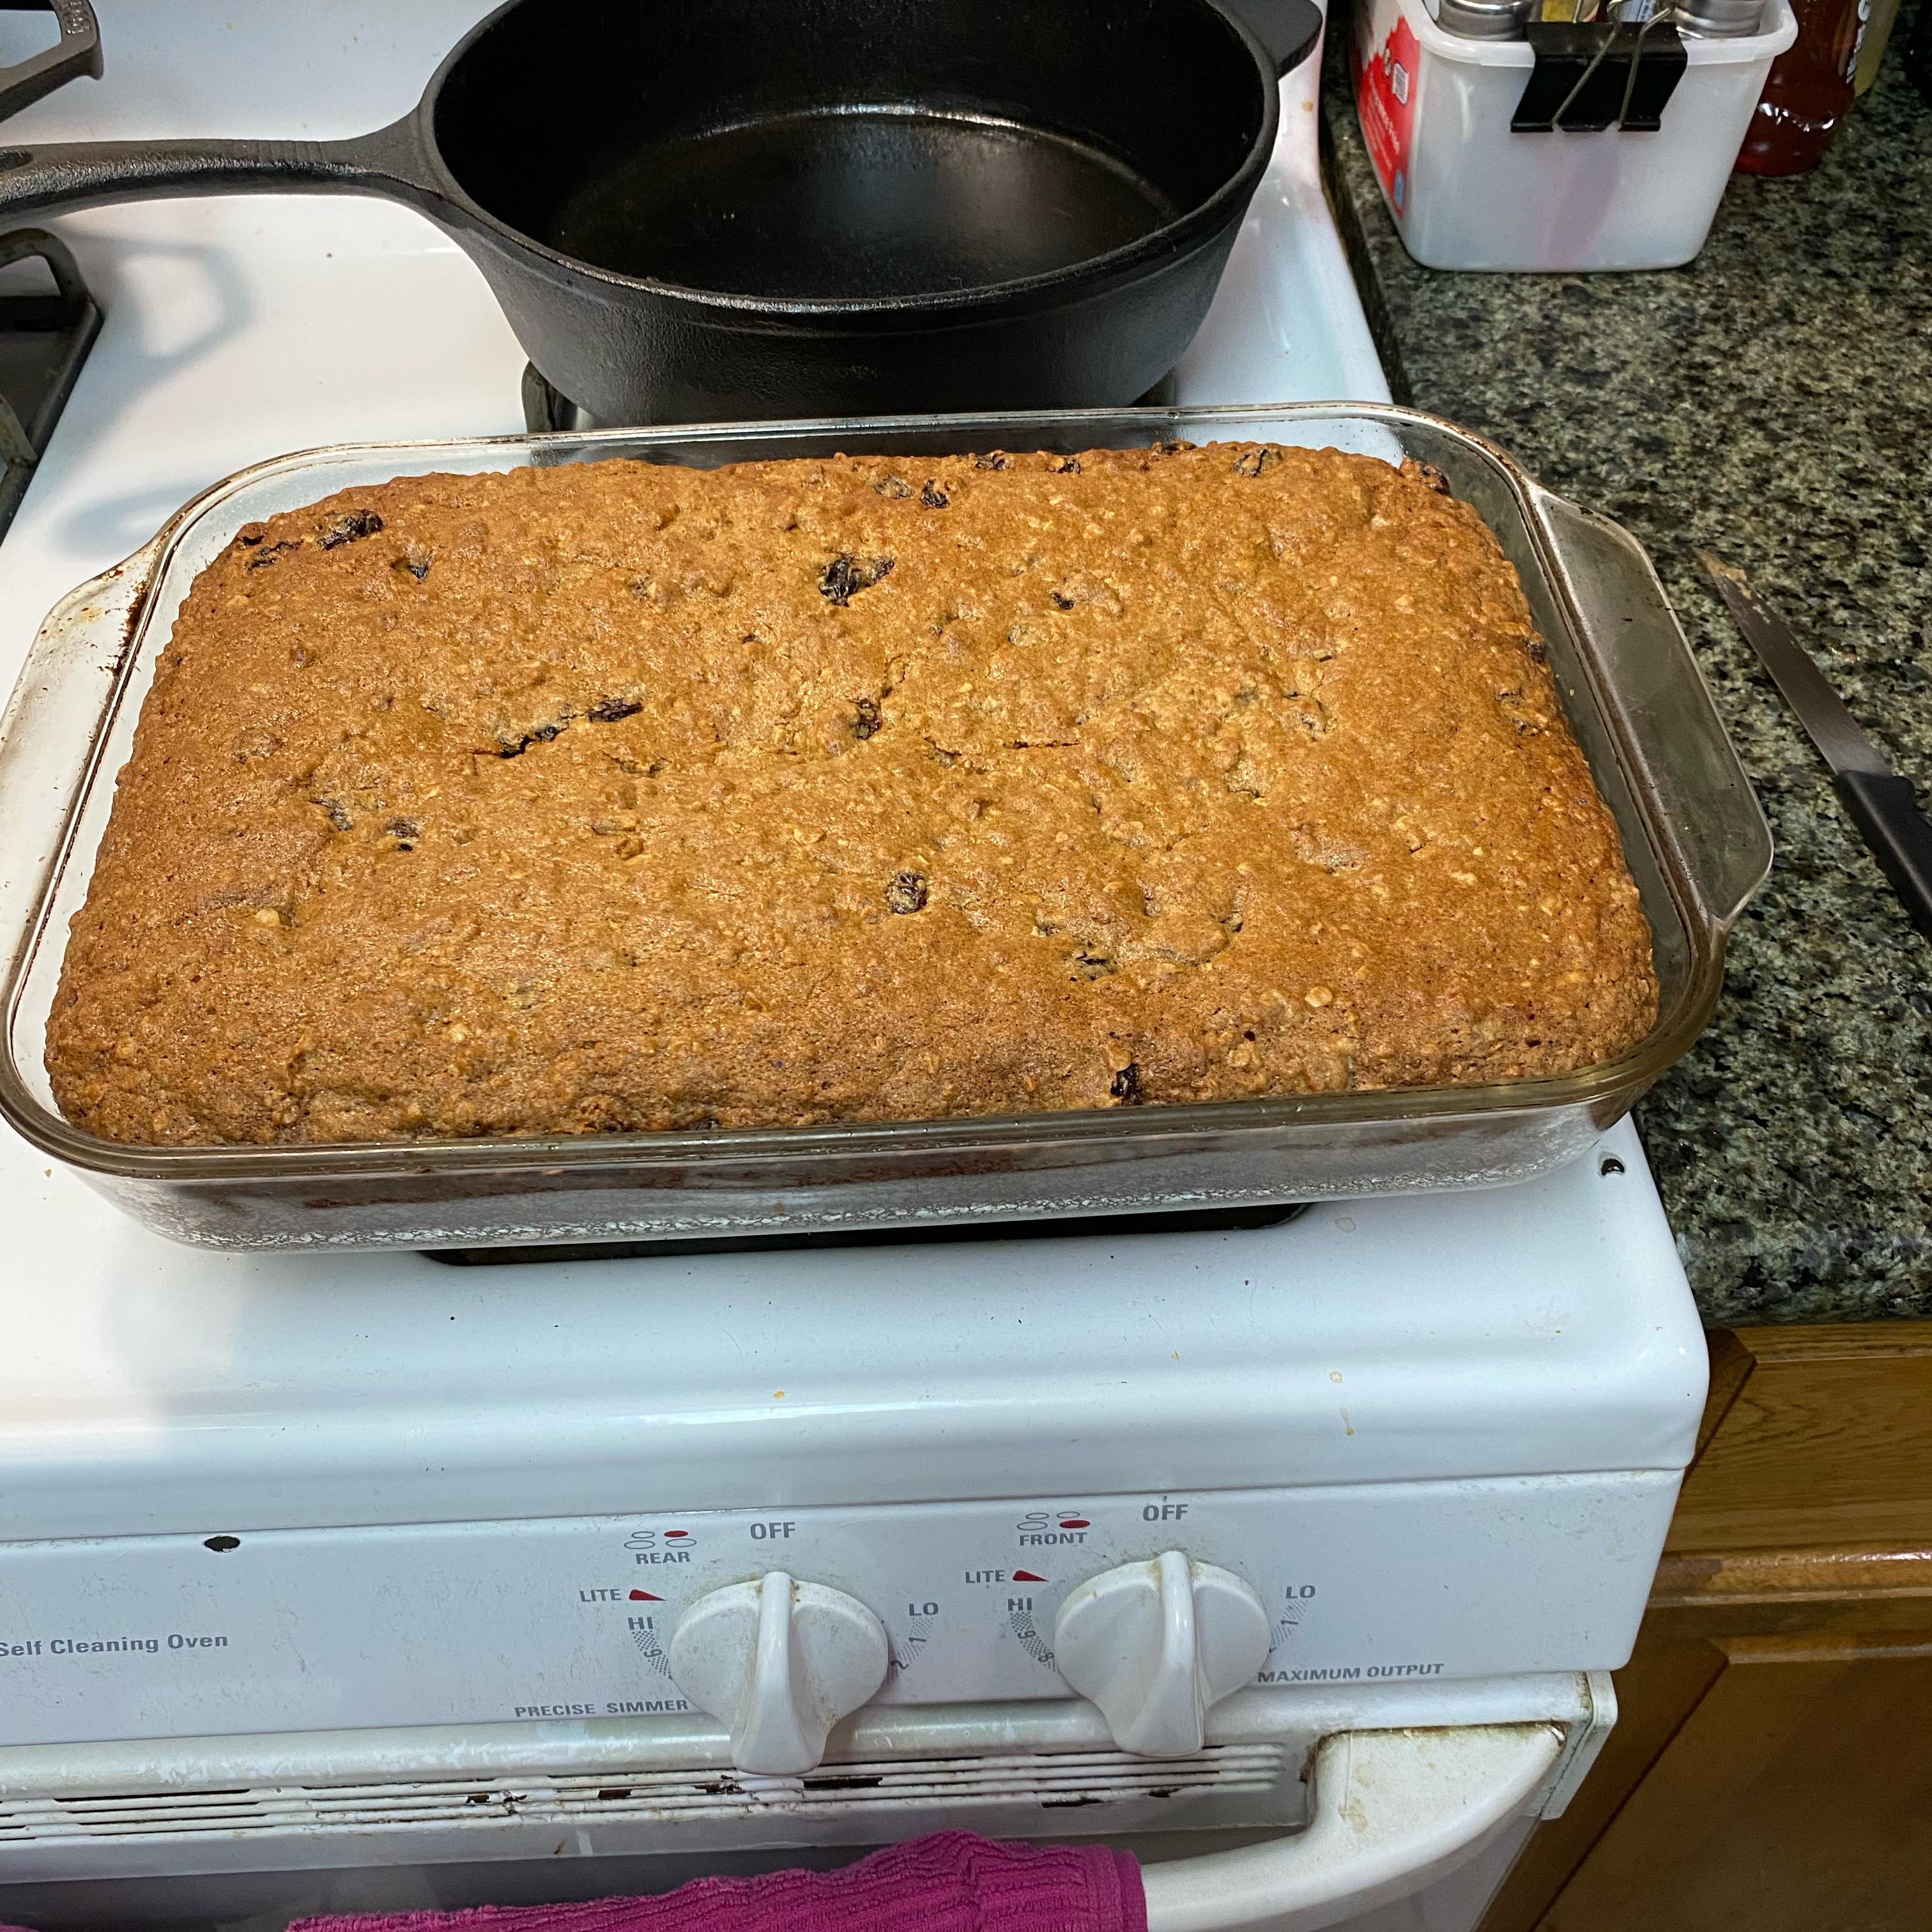 Oatmeal Raisin Cookies III Lore Apted